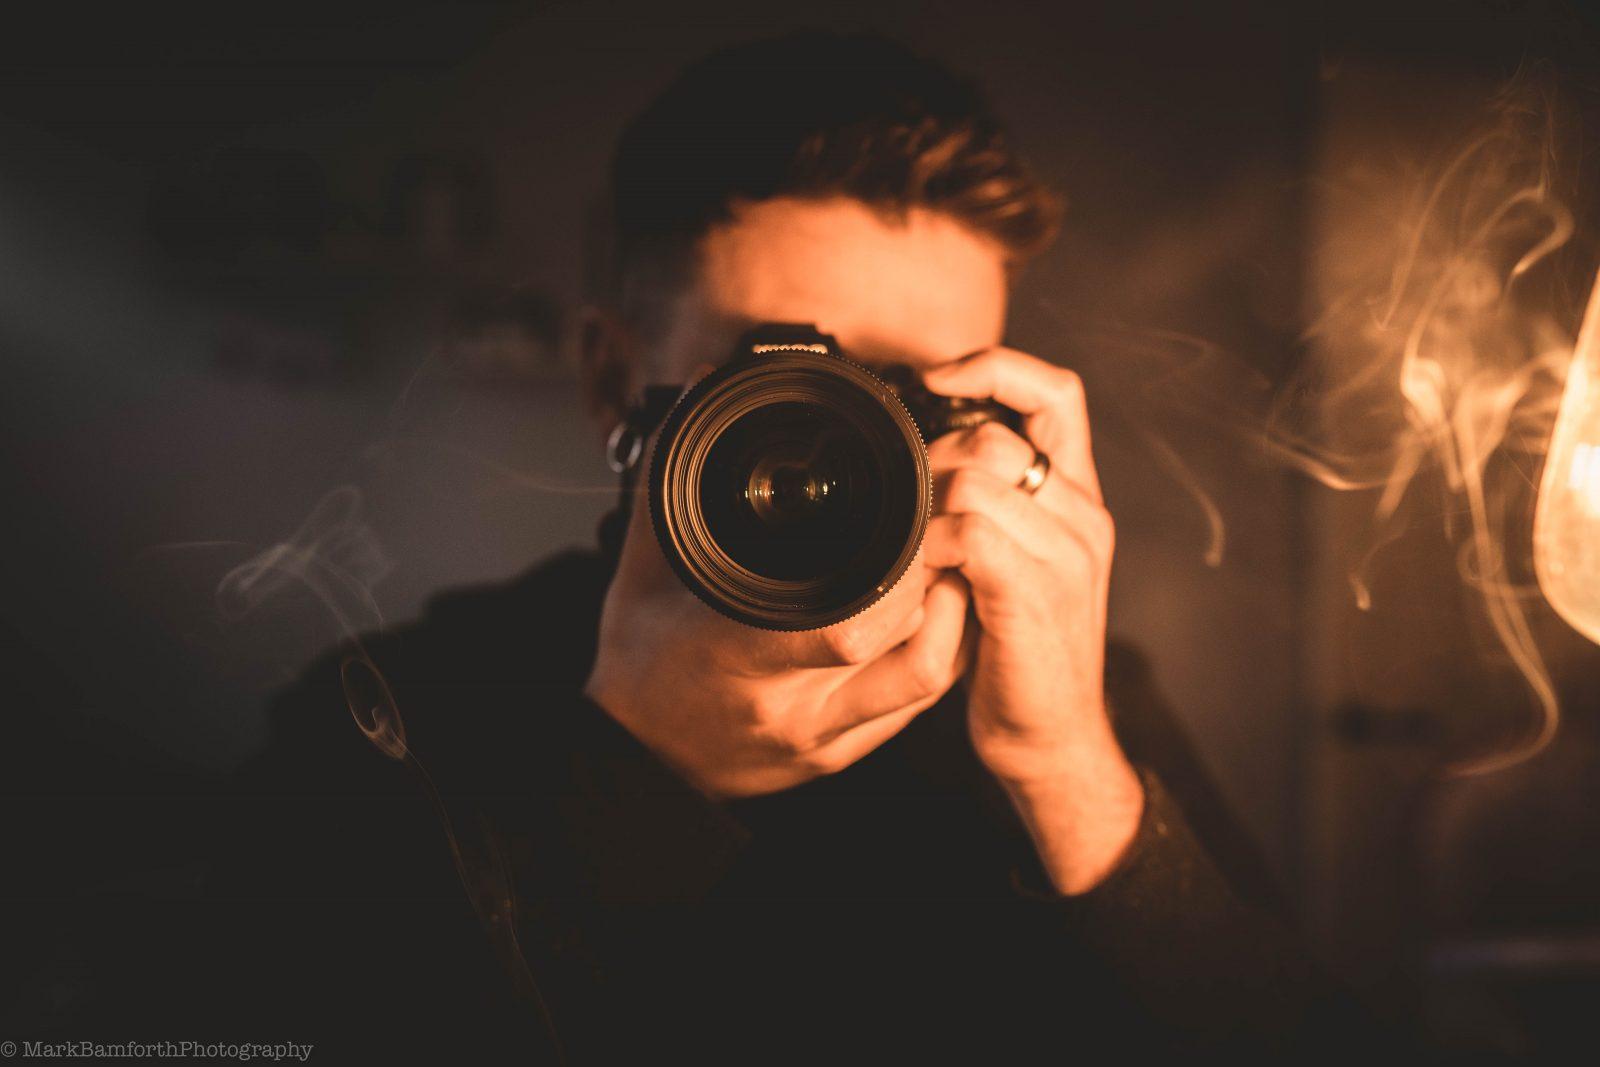 Mark Bamforth Photography